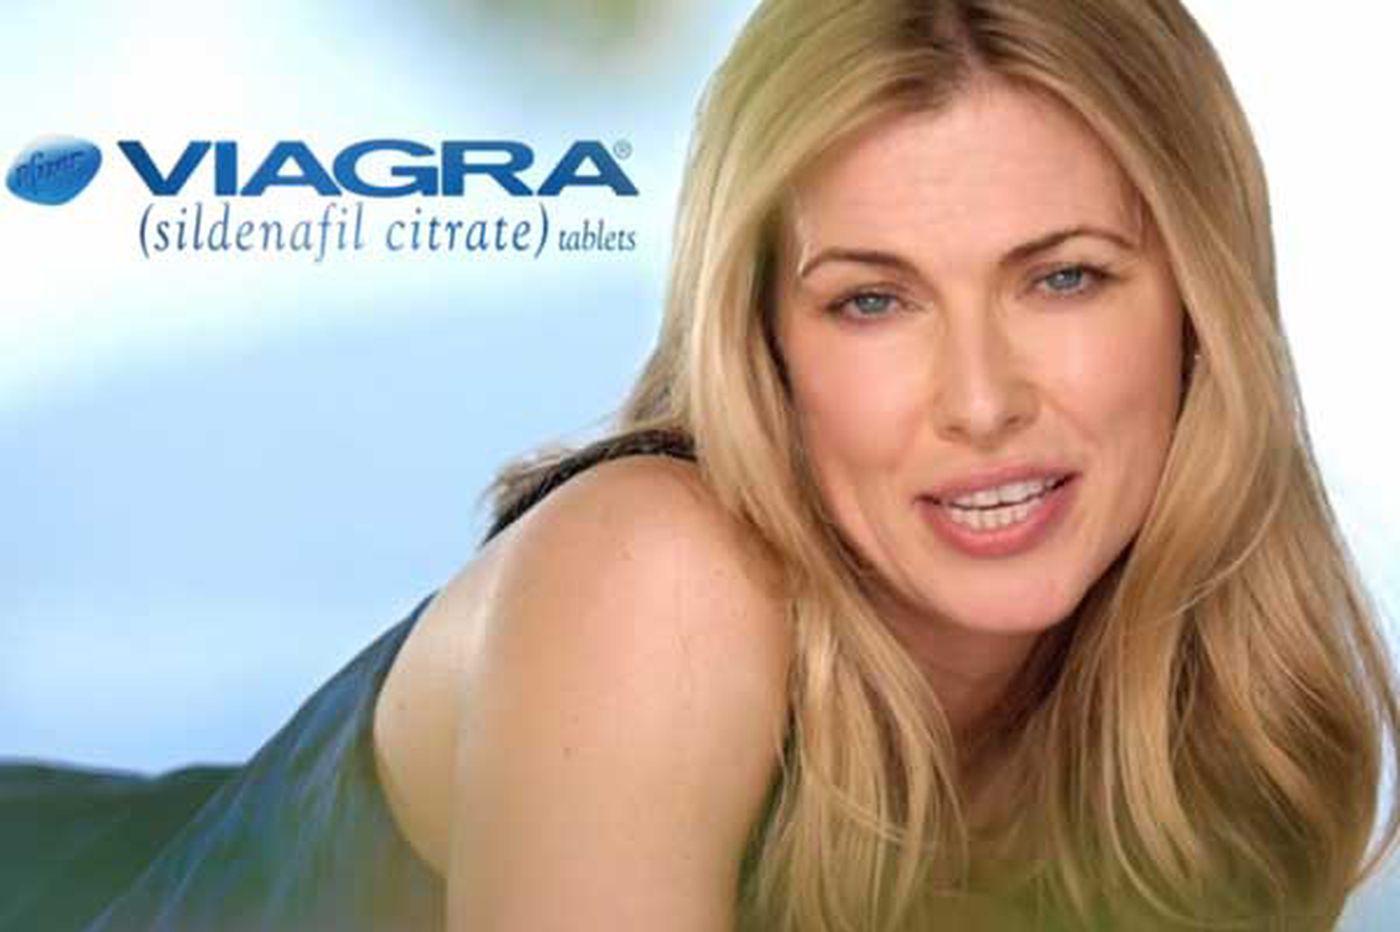 Viagra ads becoming more explicit